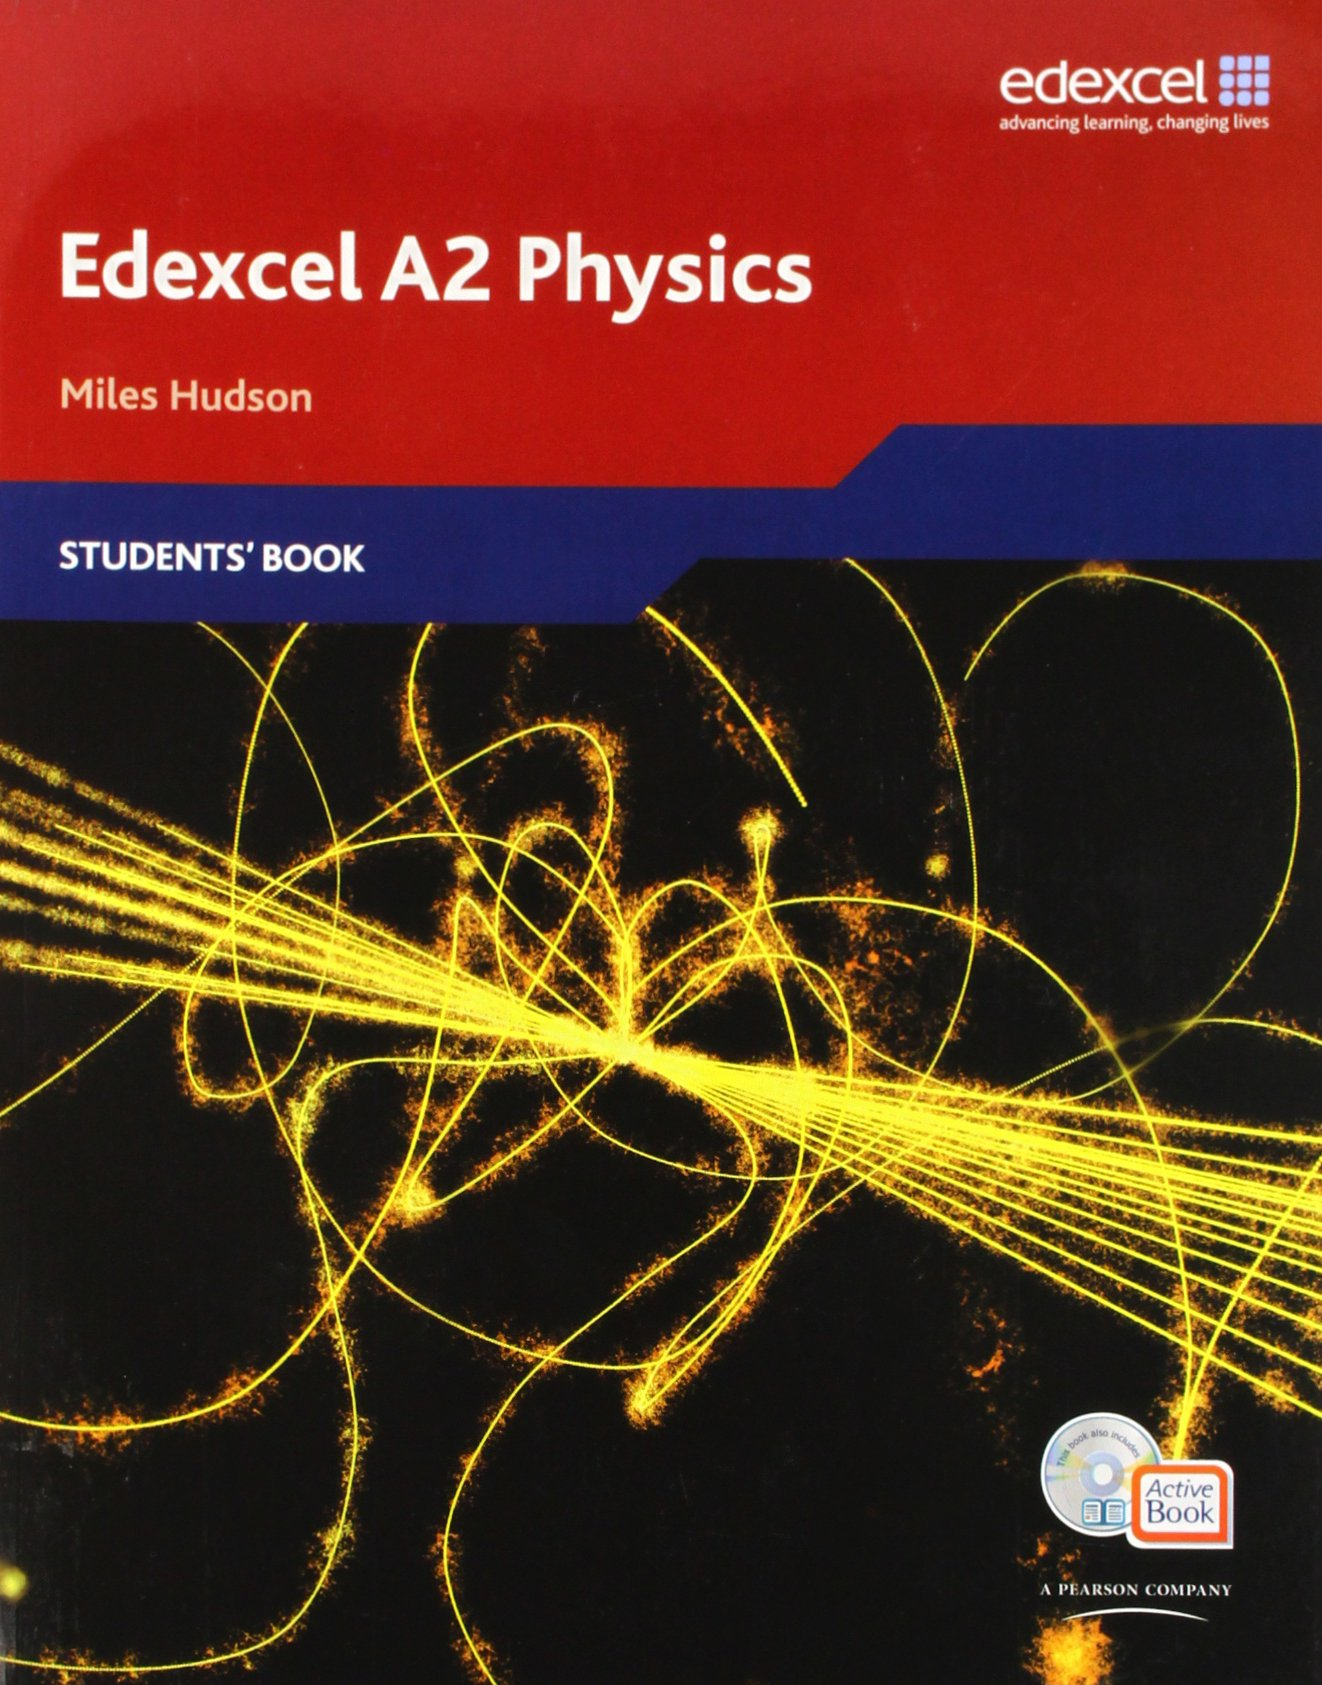 Edexcel coursework help